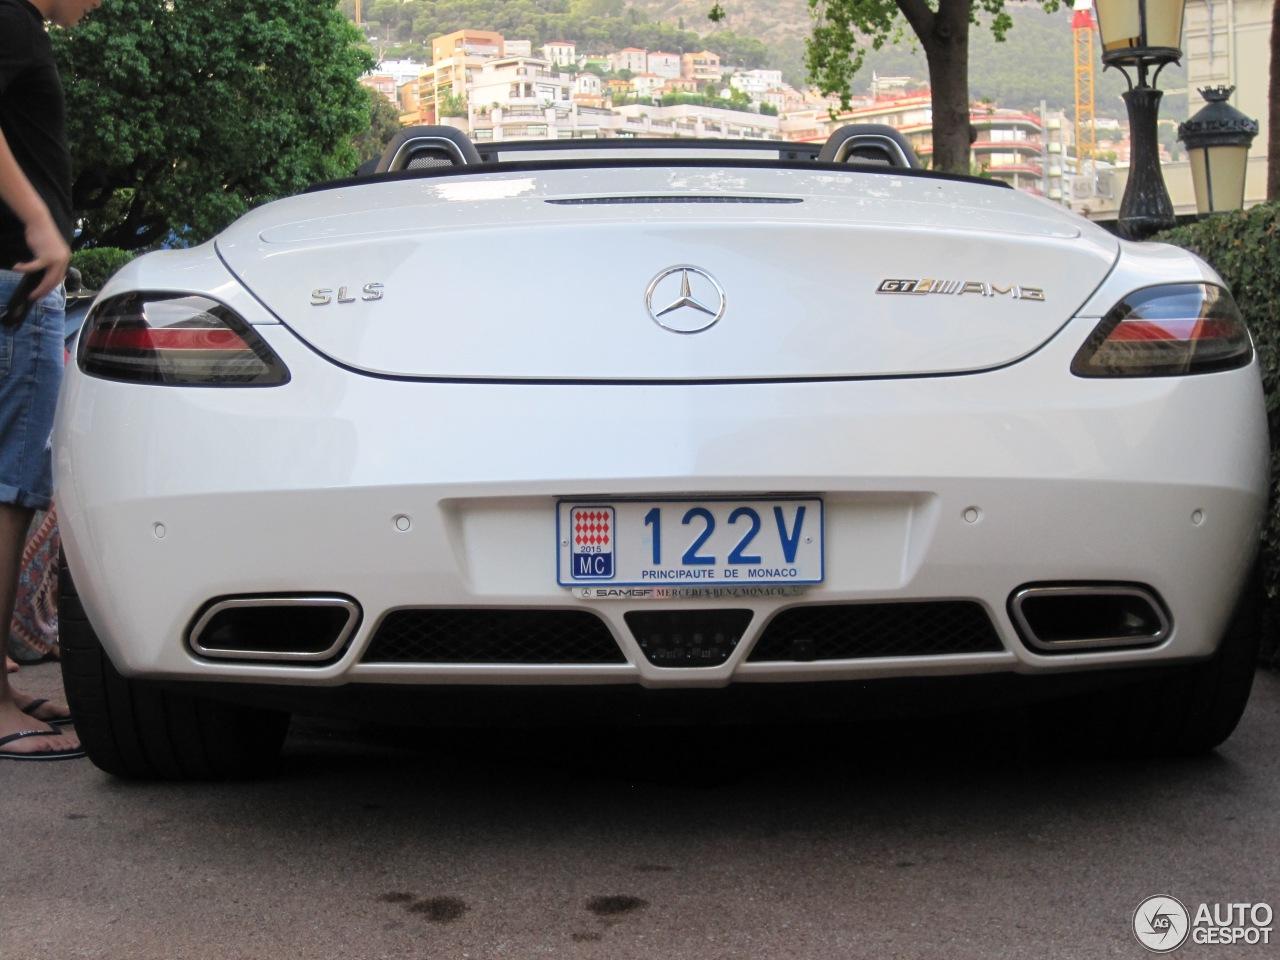 Mercedes benz sls amg gt roadster 23 augustus 2015 for 2015 mercedes benz sls amg convertible